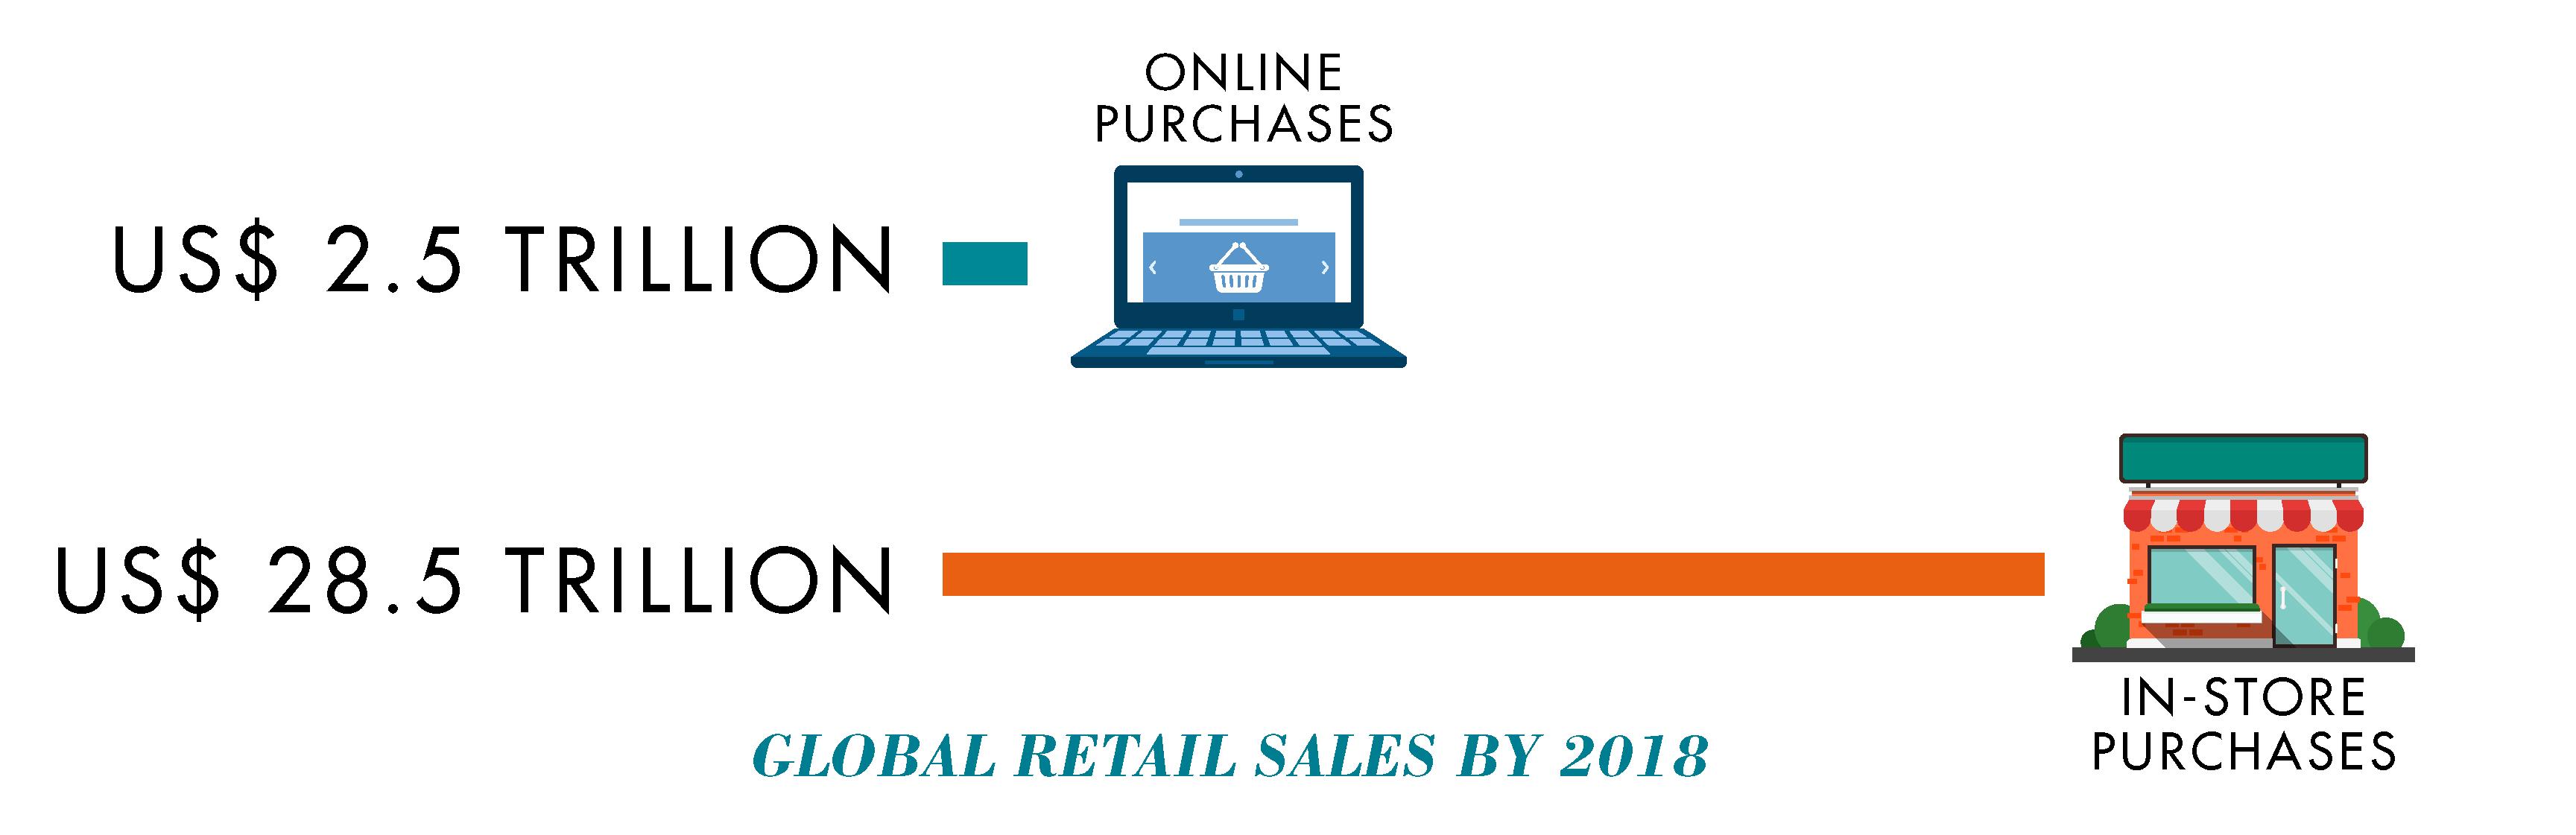 Global retail sales by 2018